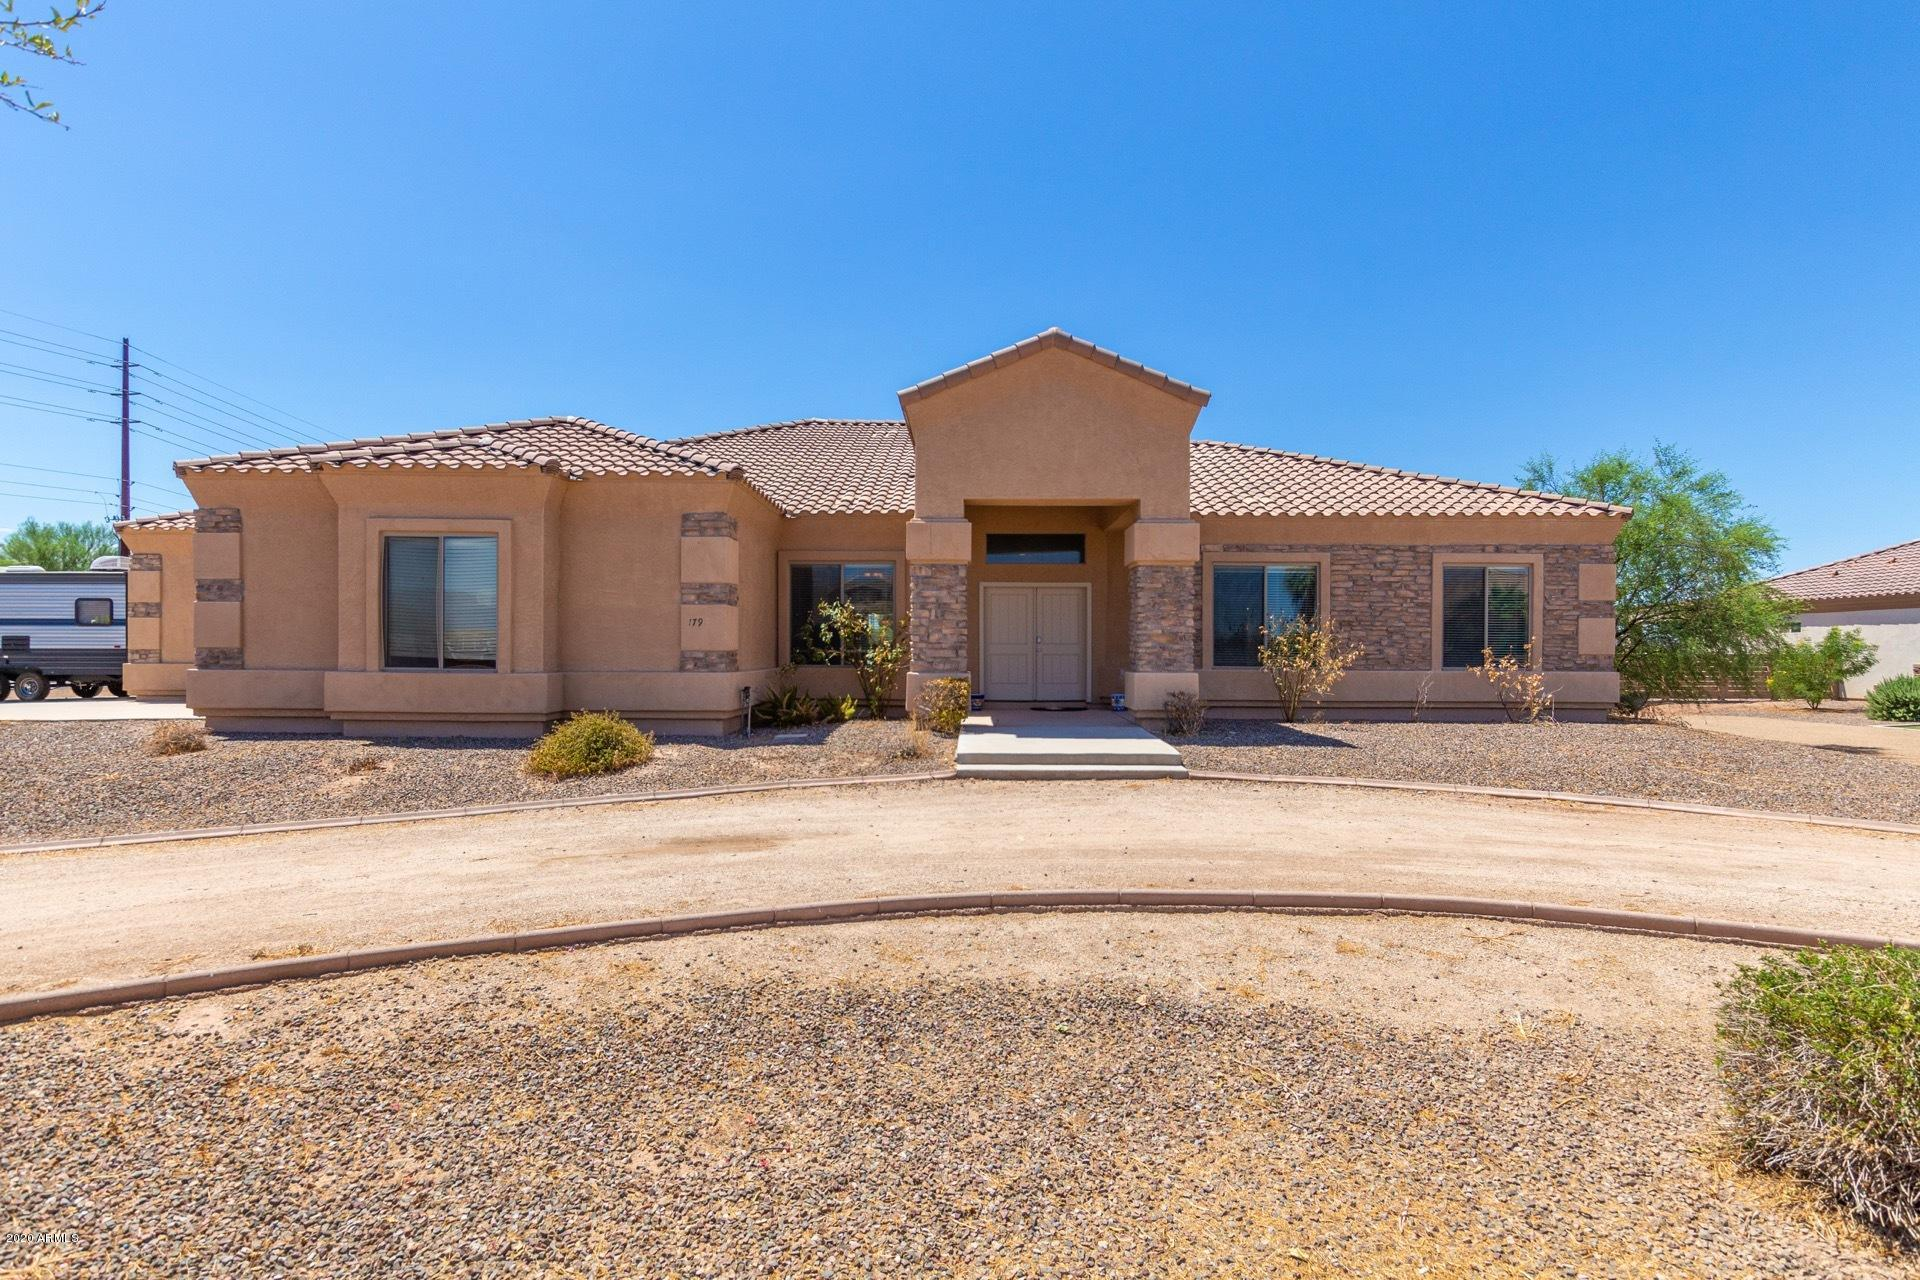 Photo of 1797 E LOVELAND Lane, San Tan Valley, AZ 85140